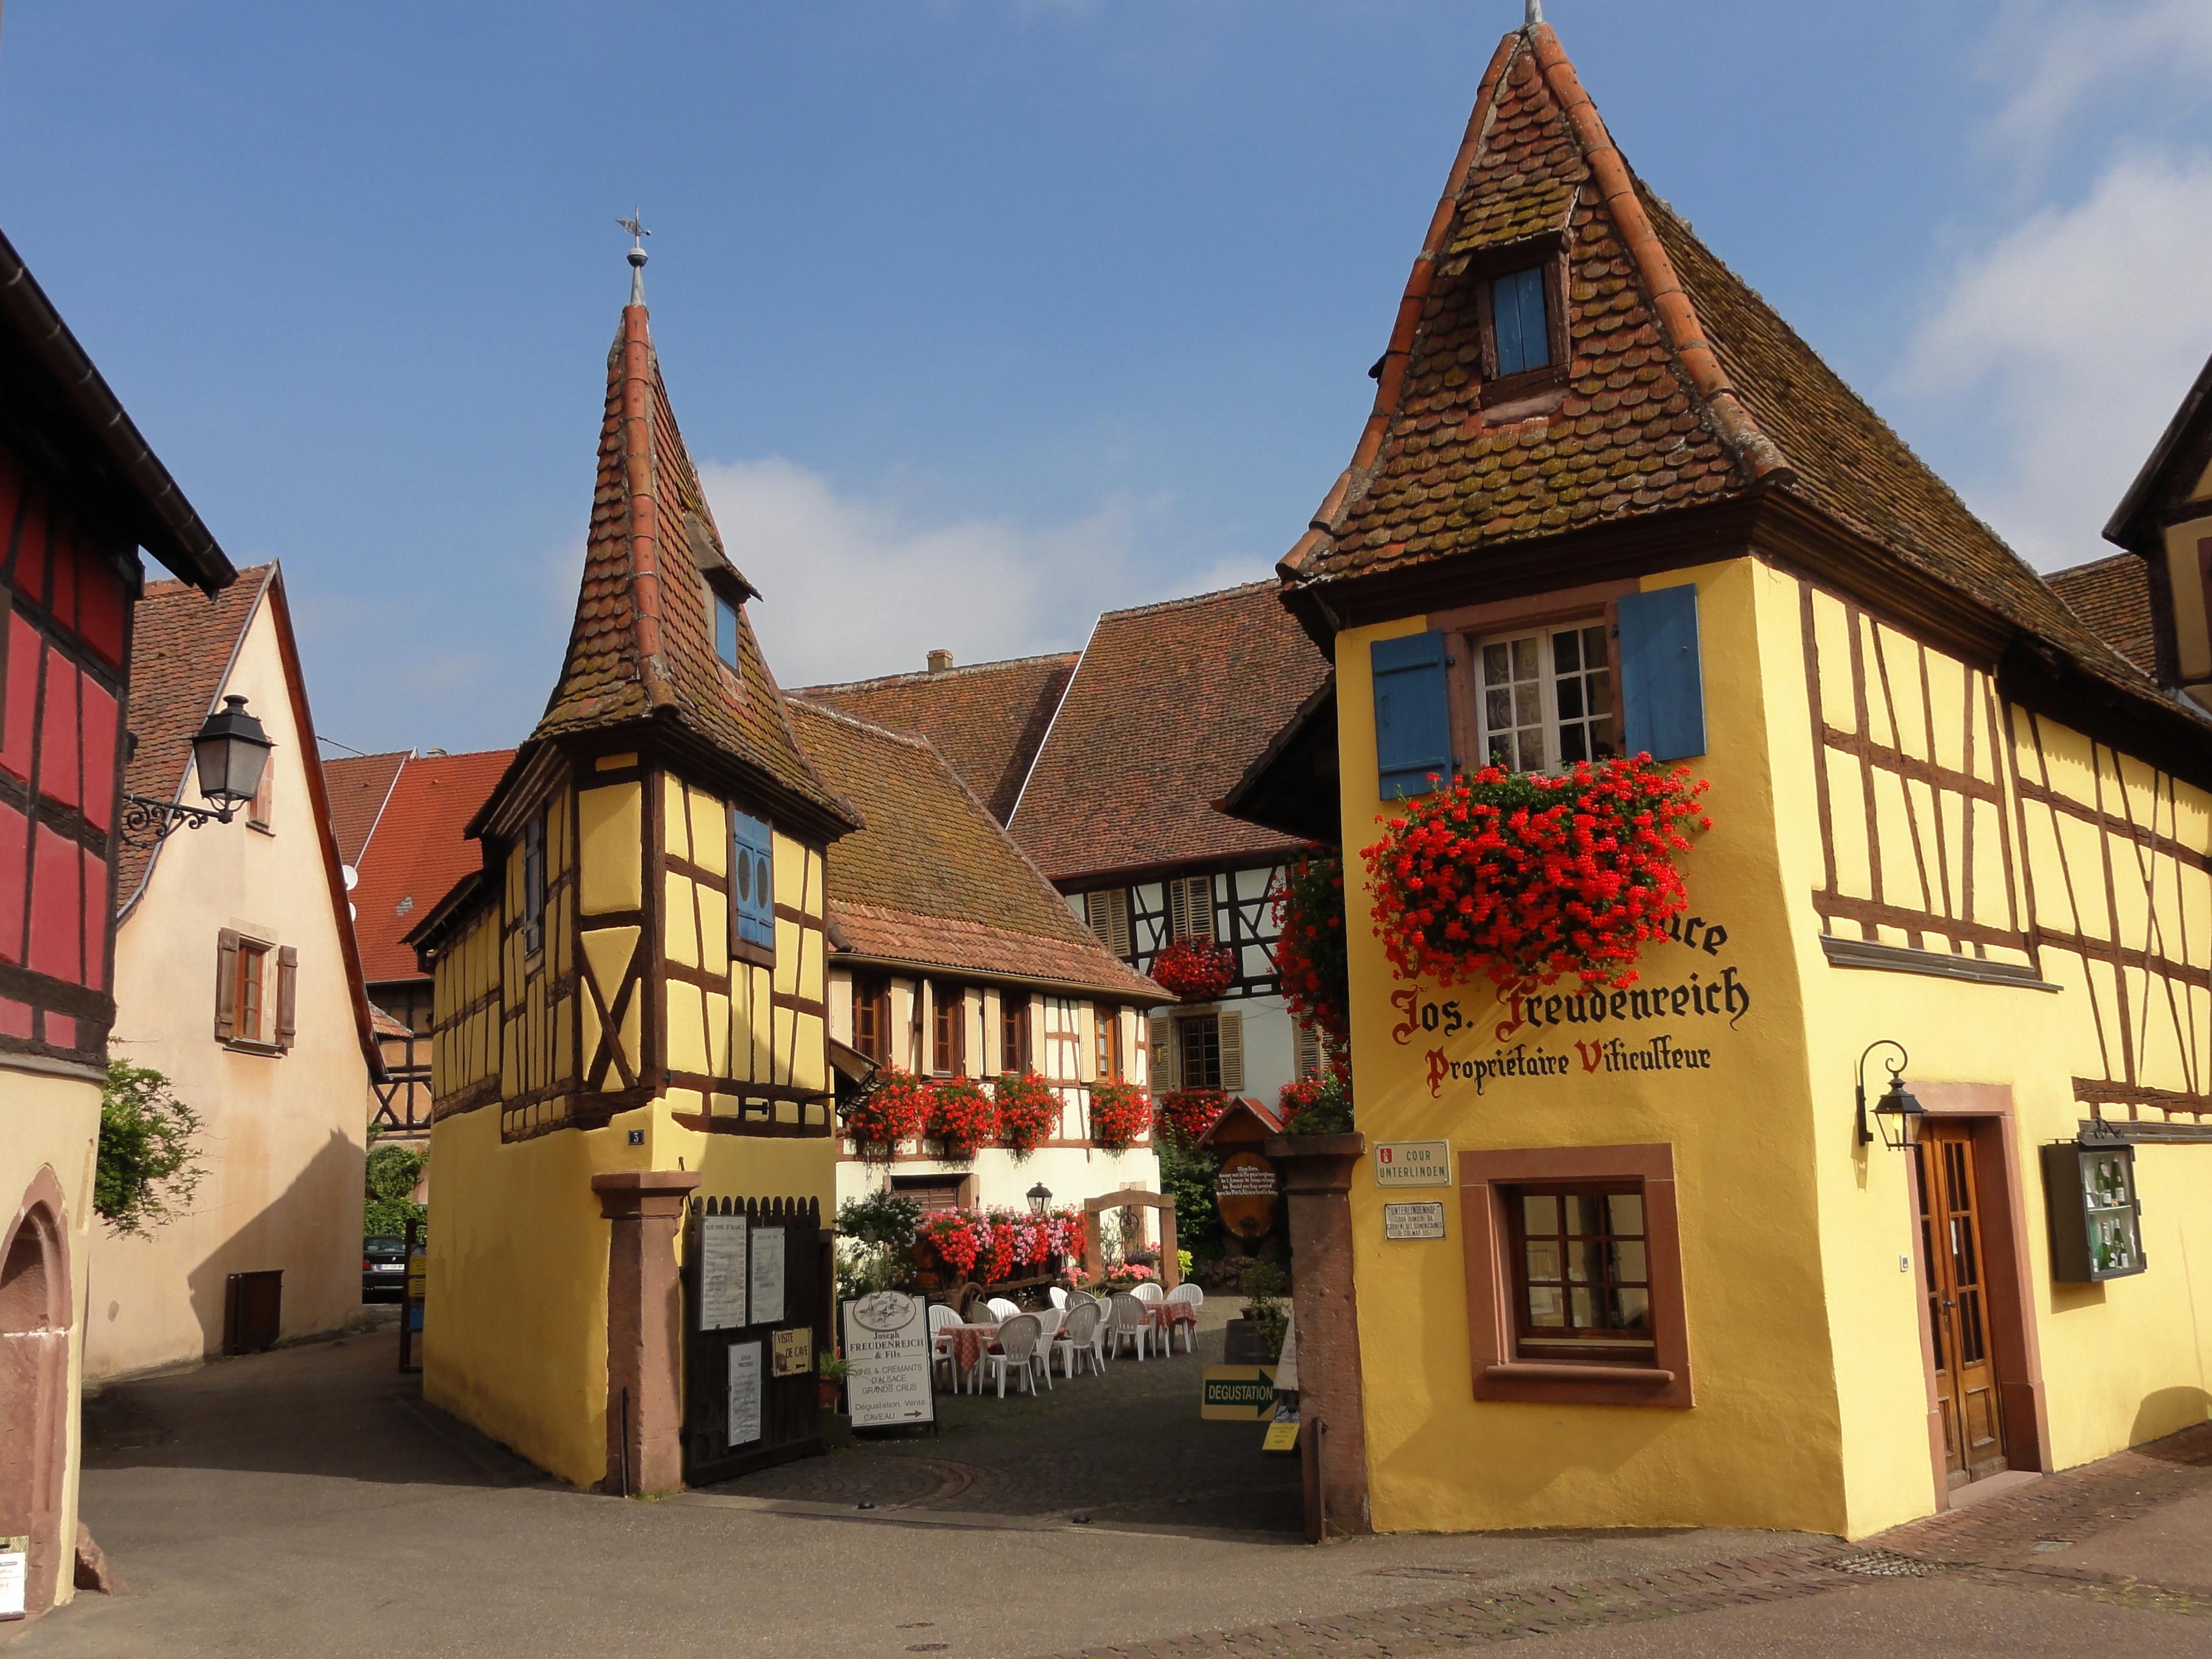 https://upload.wikimedia.org/wikipedia/commons/e/ec/Eguisheim_CourUnterlinden_3a.JPG?uselang=fr